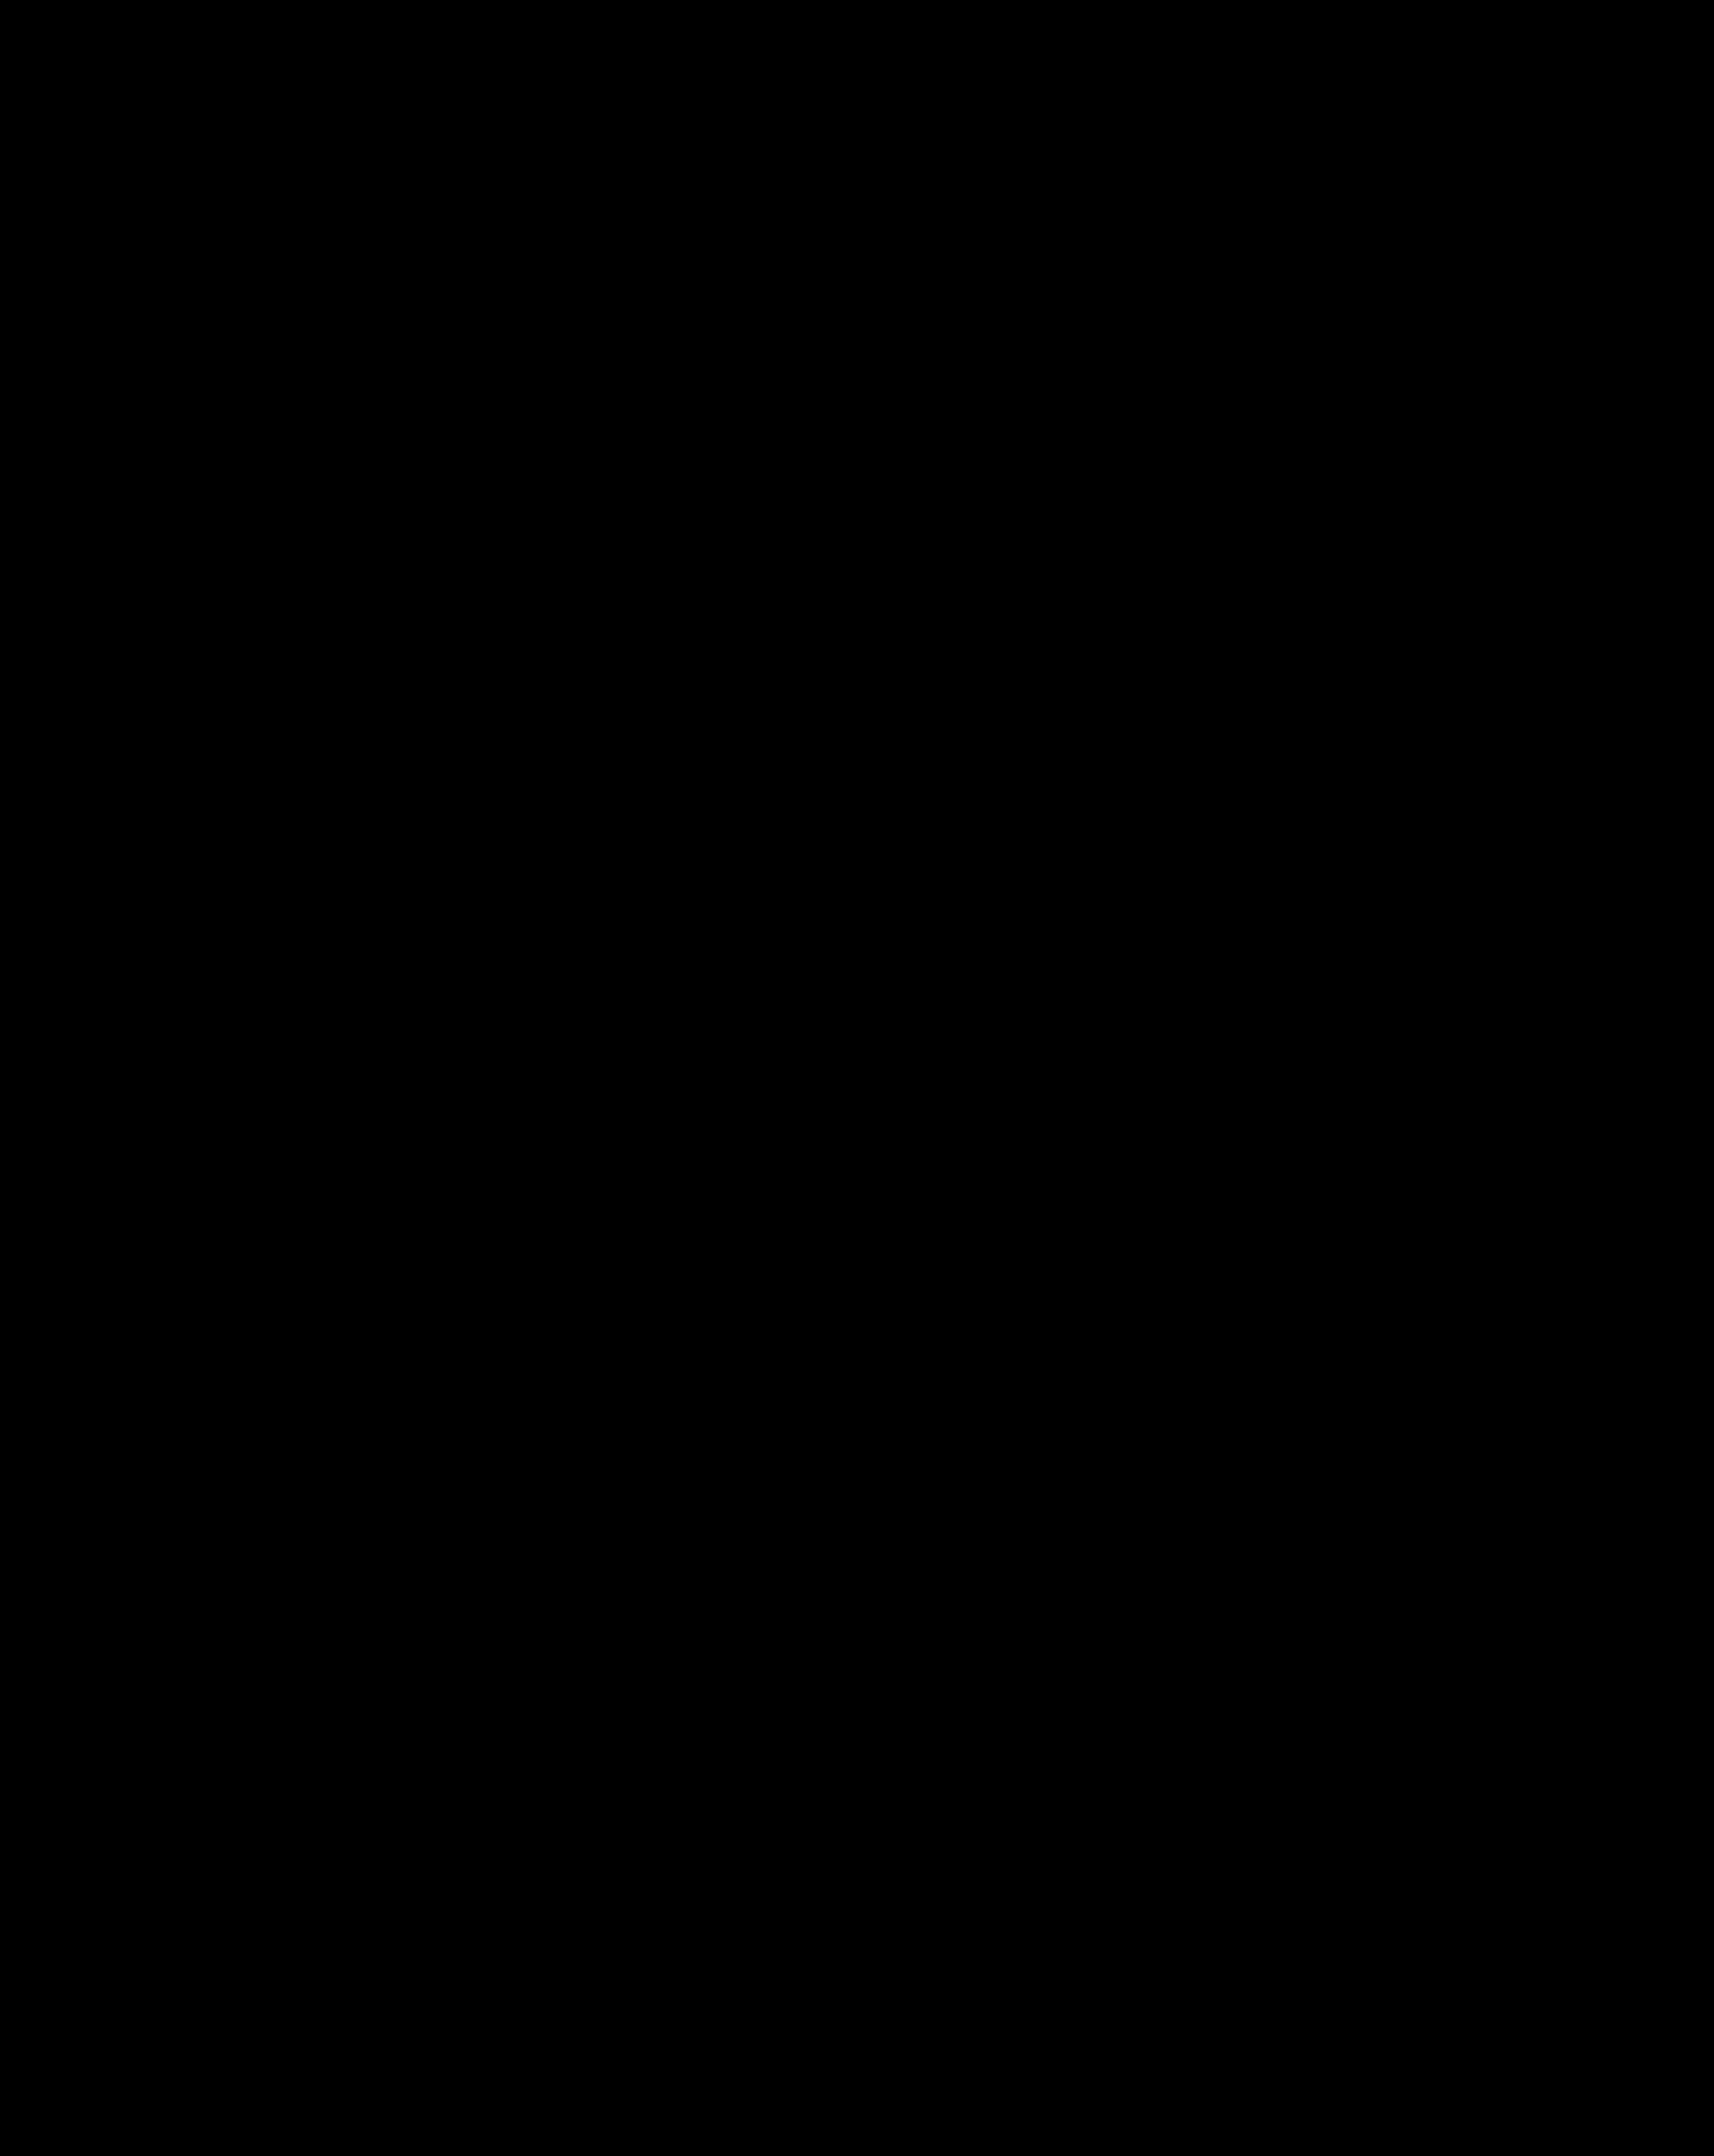 1908x2400 Aries Ram Vector Clipart Image